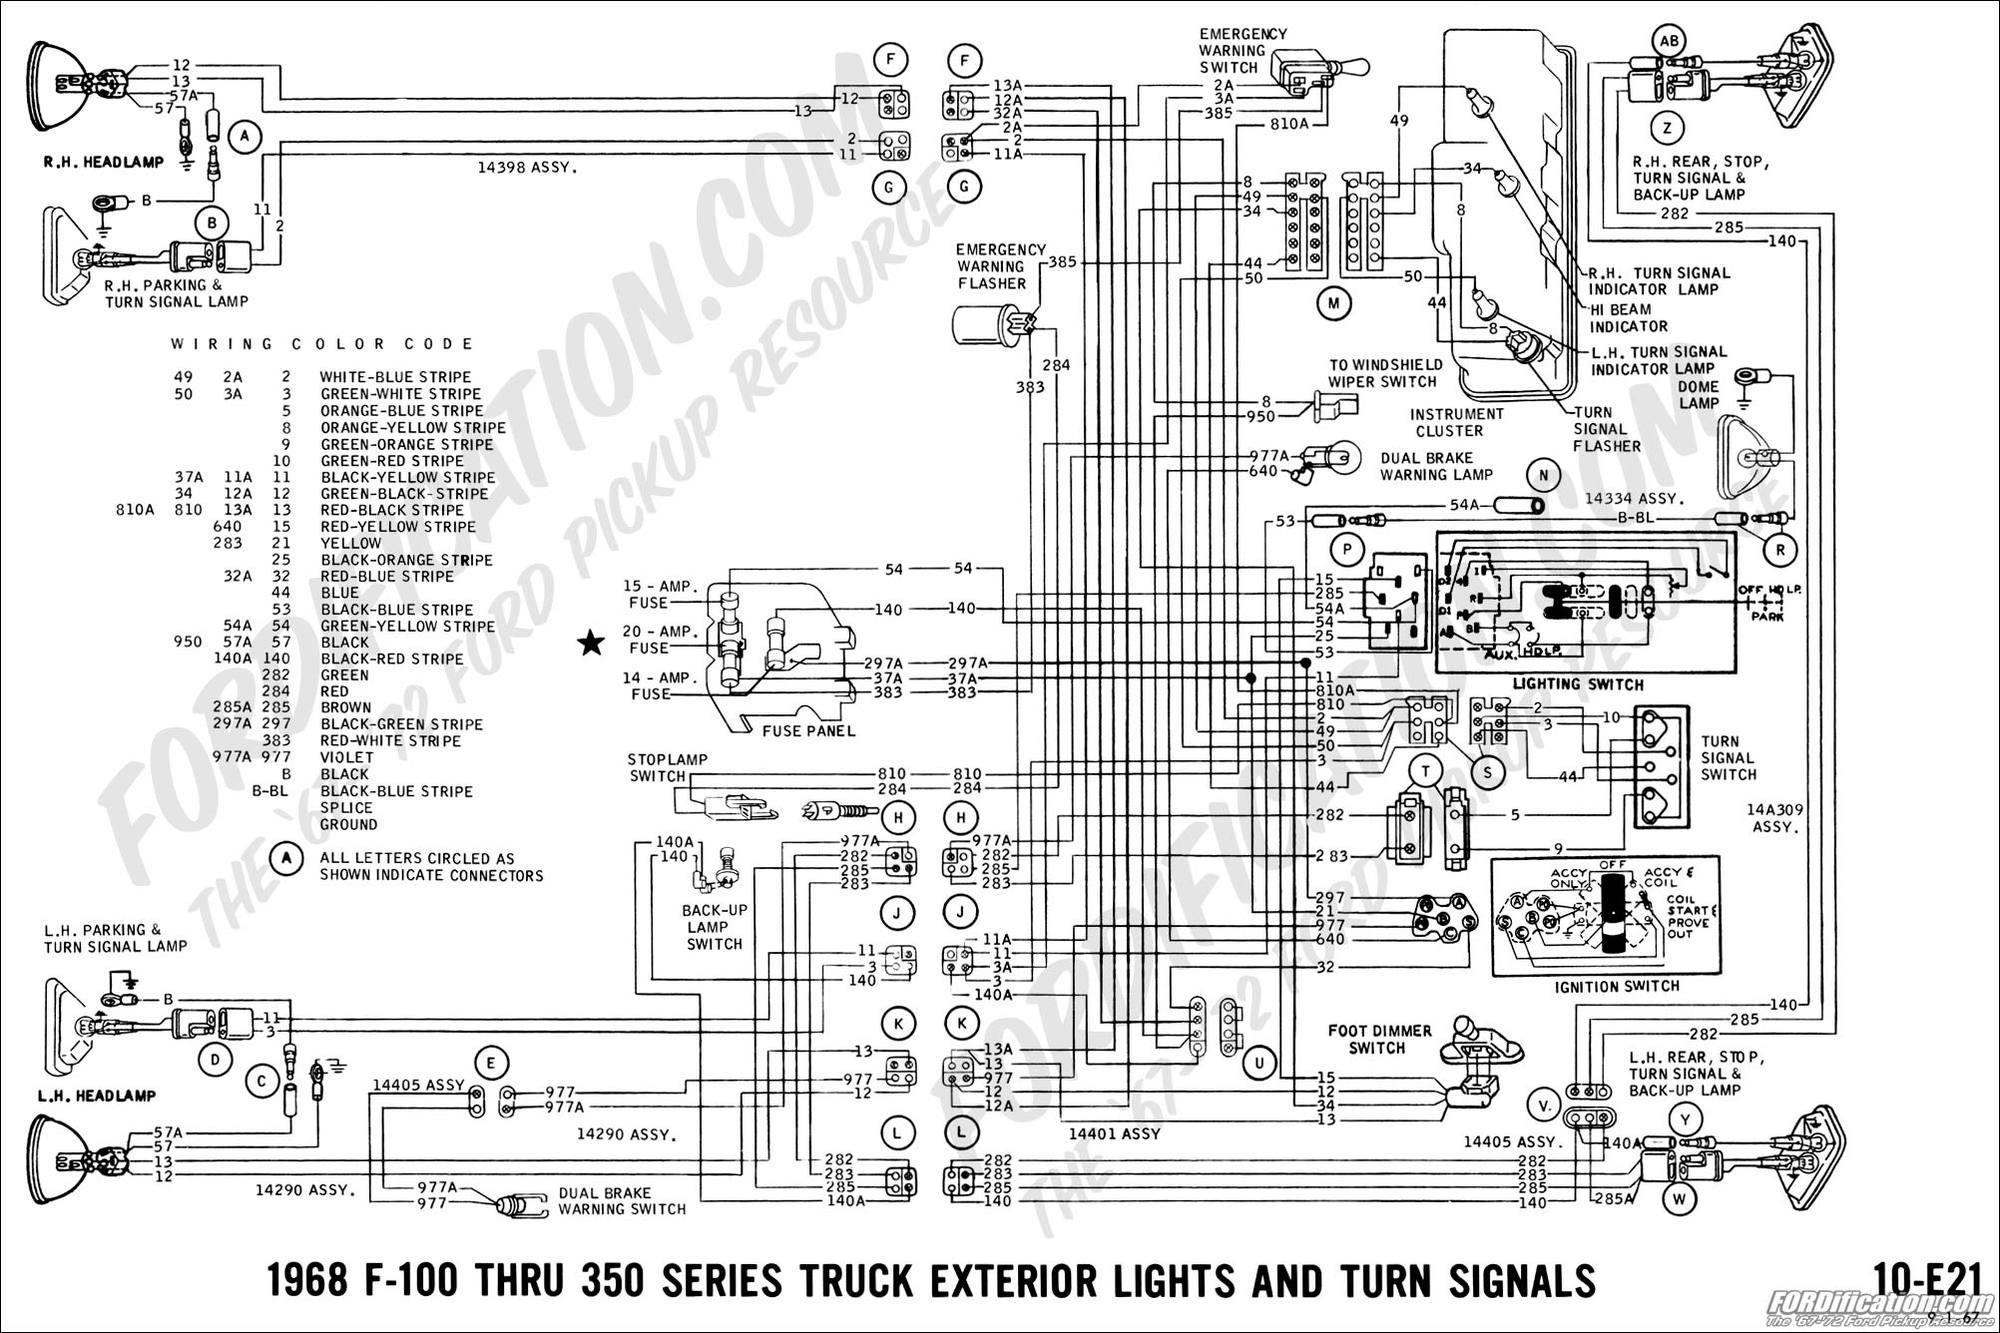 F250 Brake Light Help